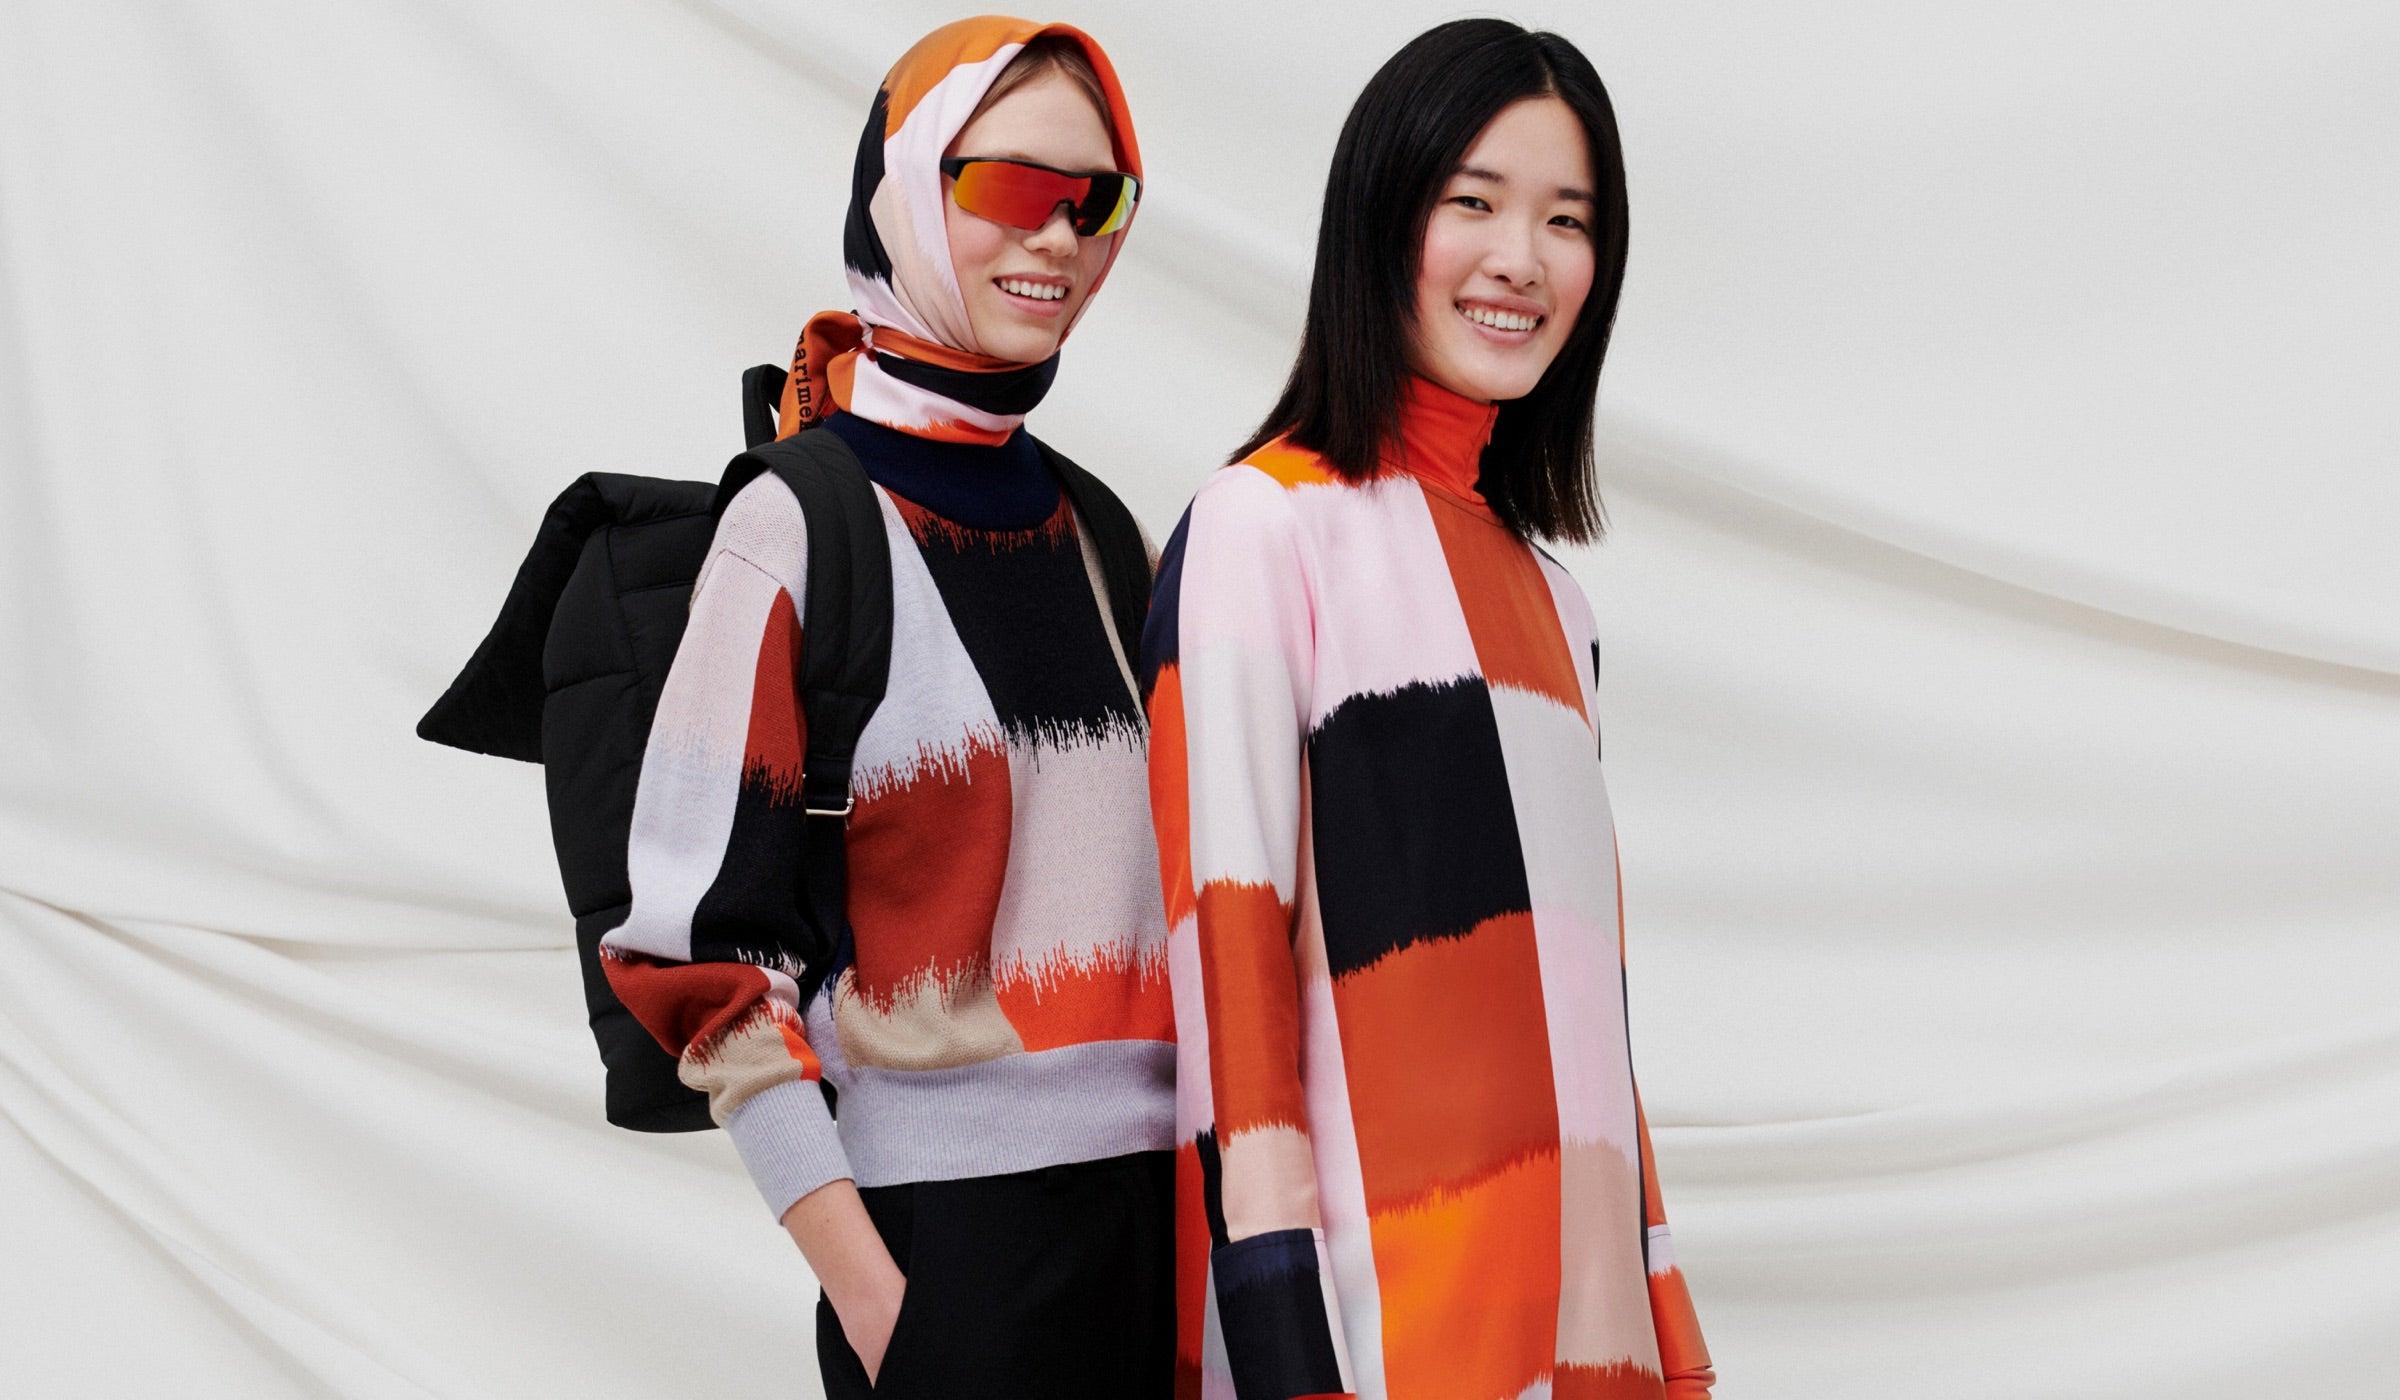 This season's Marimekko collection